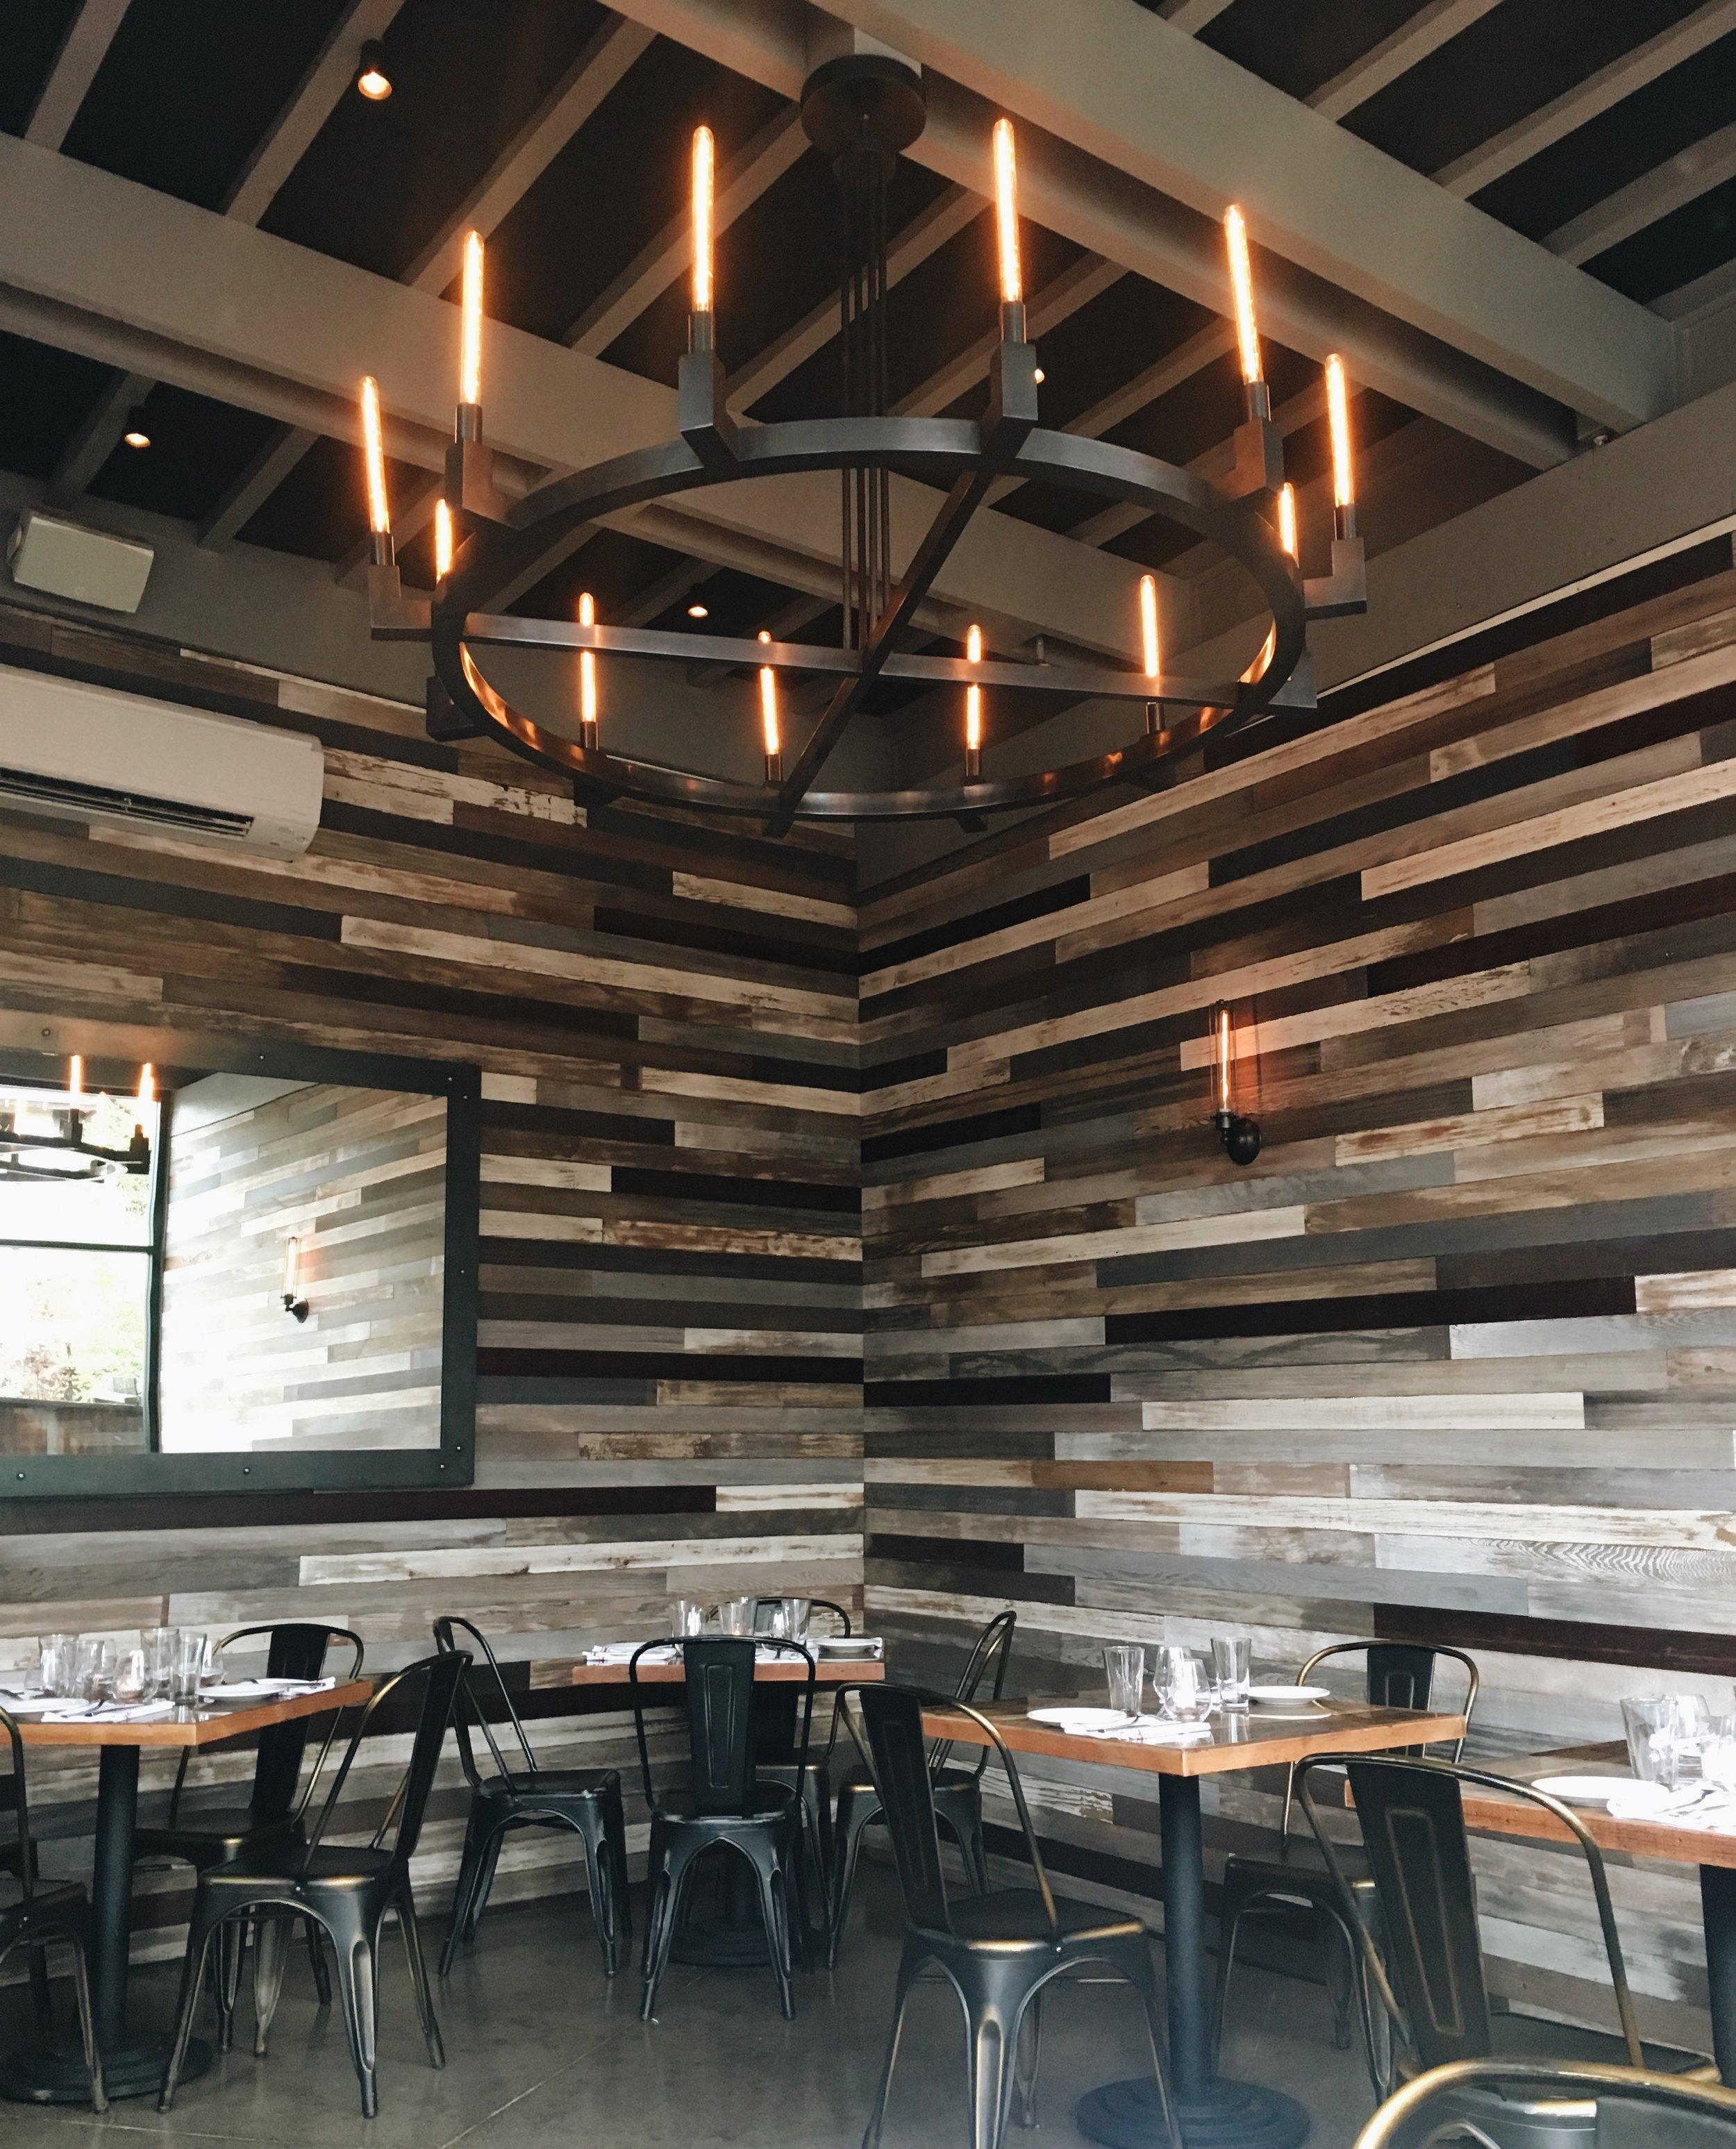 Glen Ellen Star Where to Eat in Sonoma